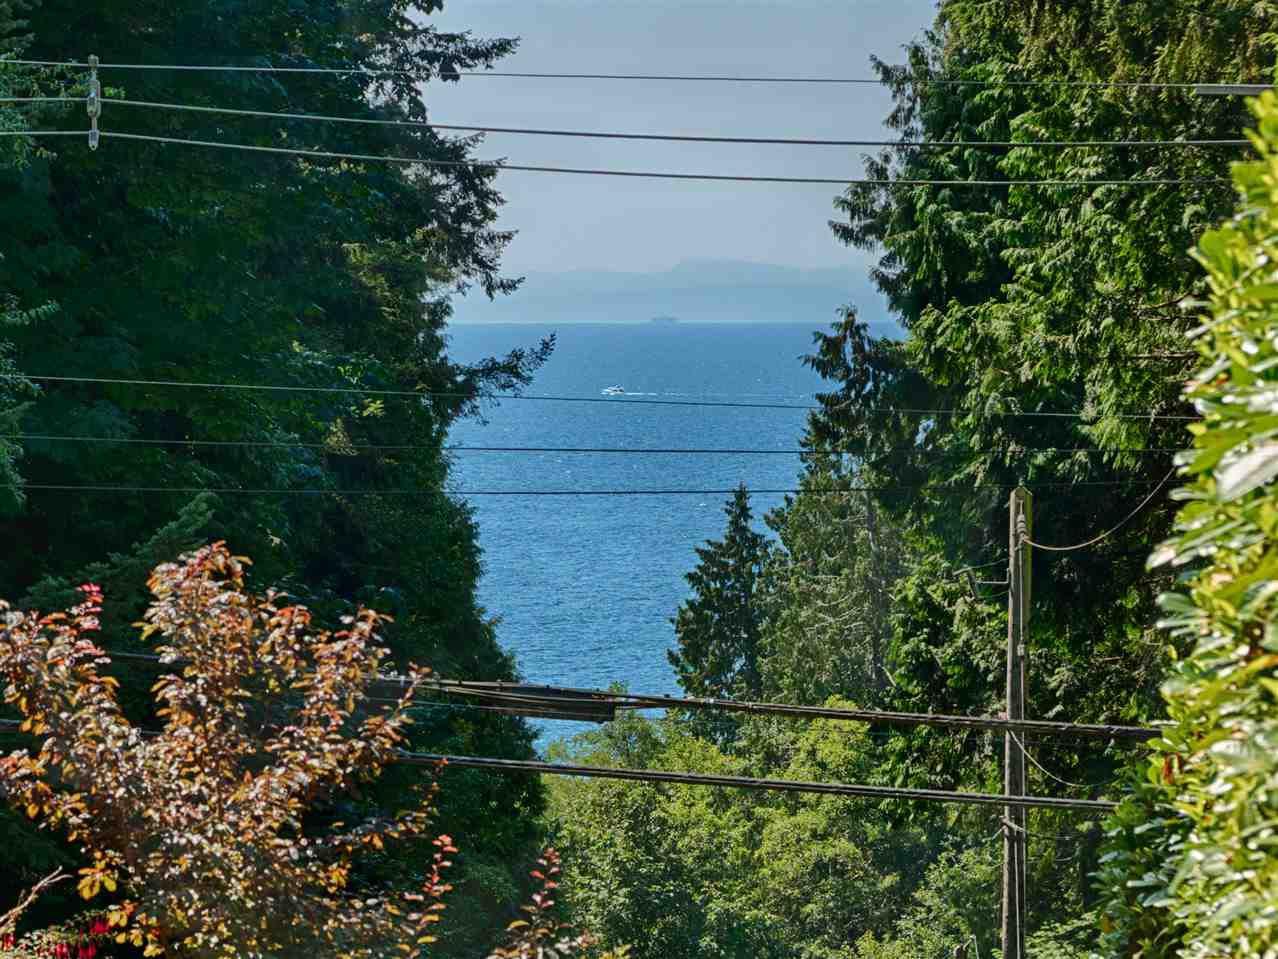 Main Photo: 1998 LOWER Road: Roberts Creek House for sale (Sunshine Coast)  : MLS®# R2333152